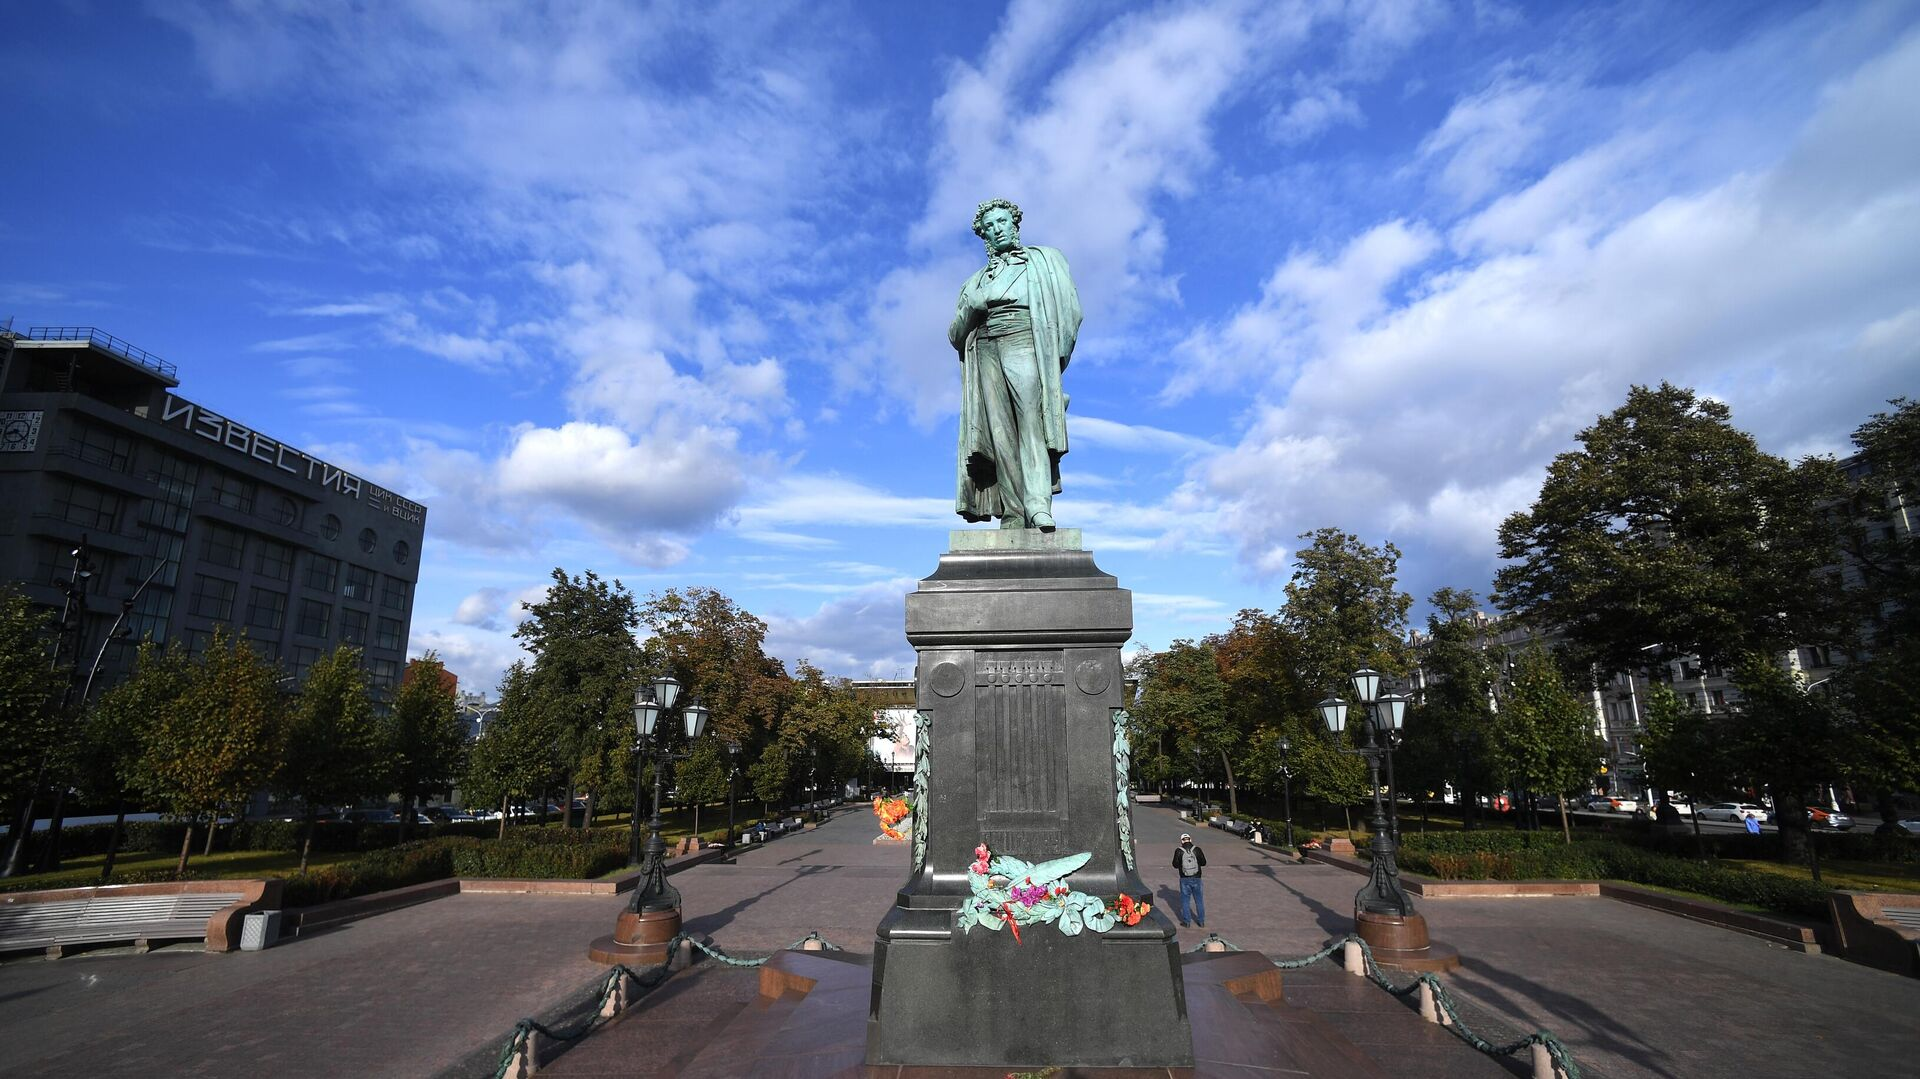 Памятник А. С. Пушкину на Пушкинской площади в Москве - РИА Новости, 1920, 20.11.2020